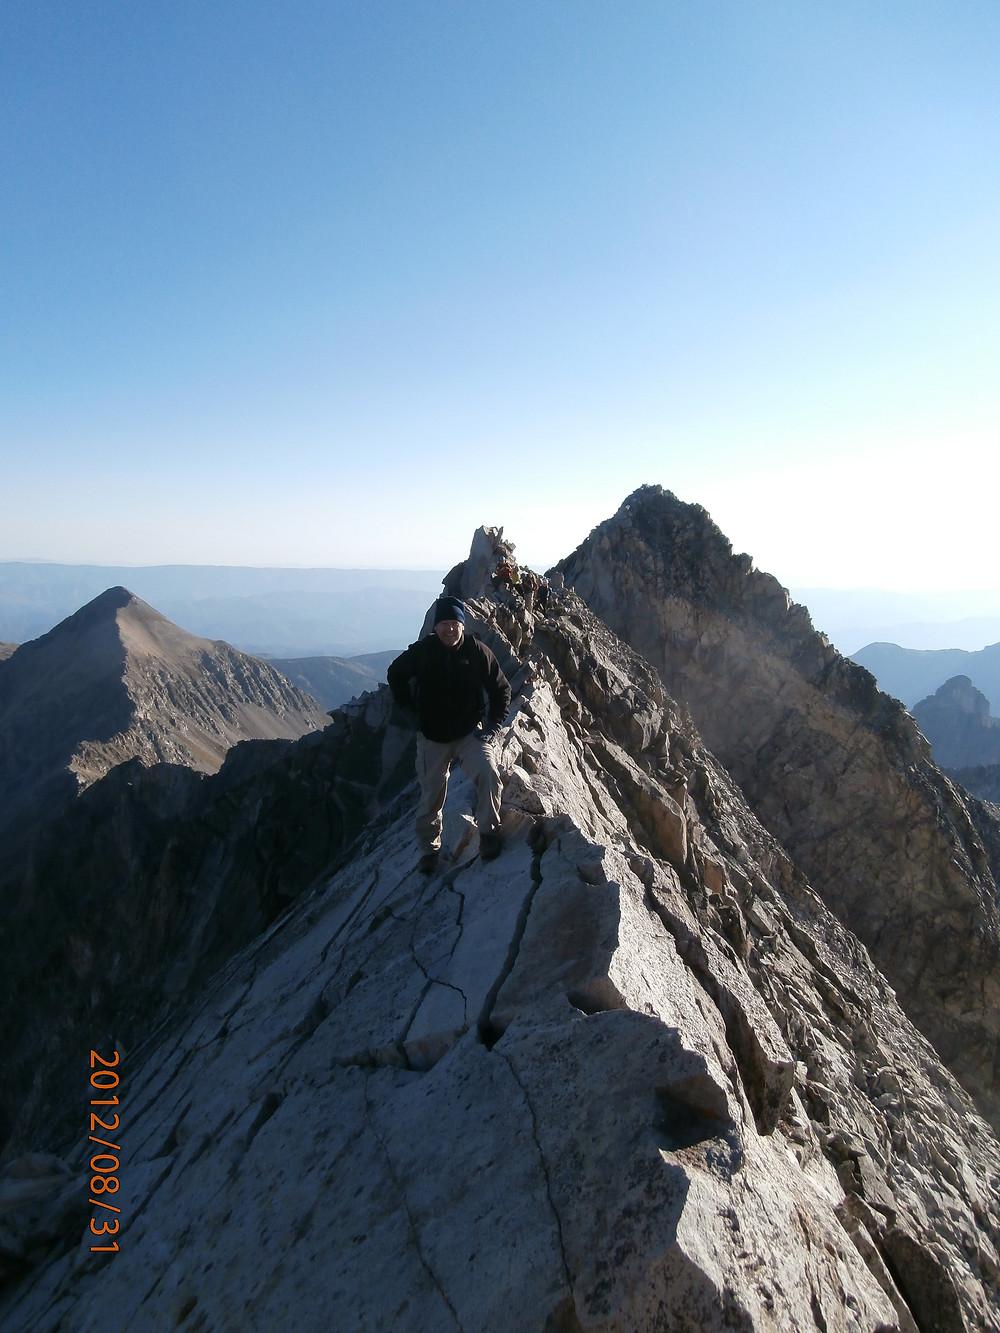 Capitol Peak, Fourteeners, 14ers, Aspen Colorado, Rocky Mountains, Backpacking, The Knife Edge